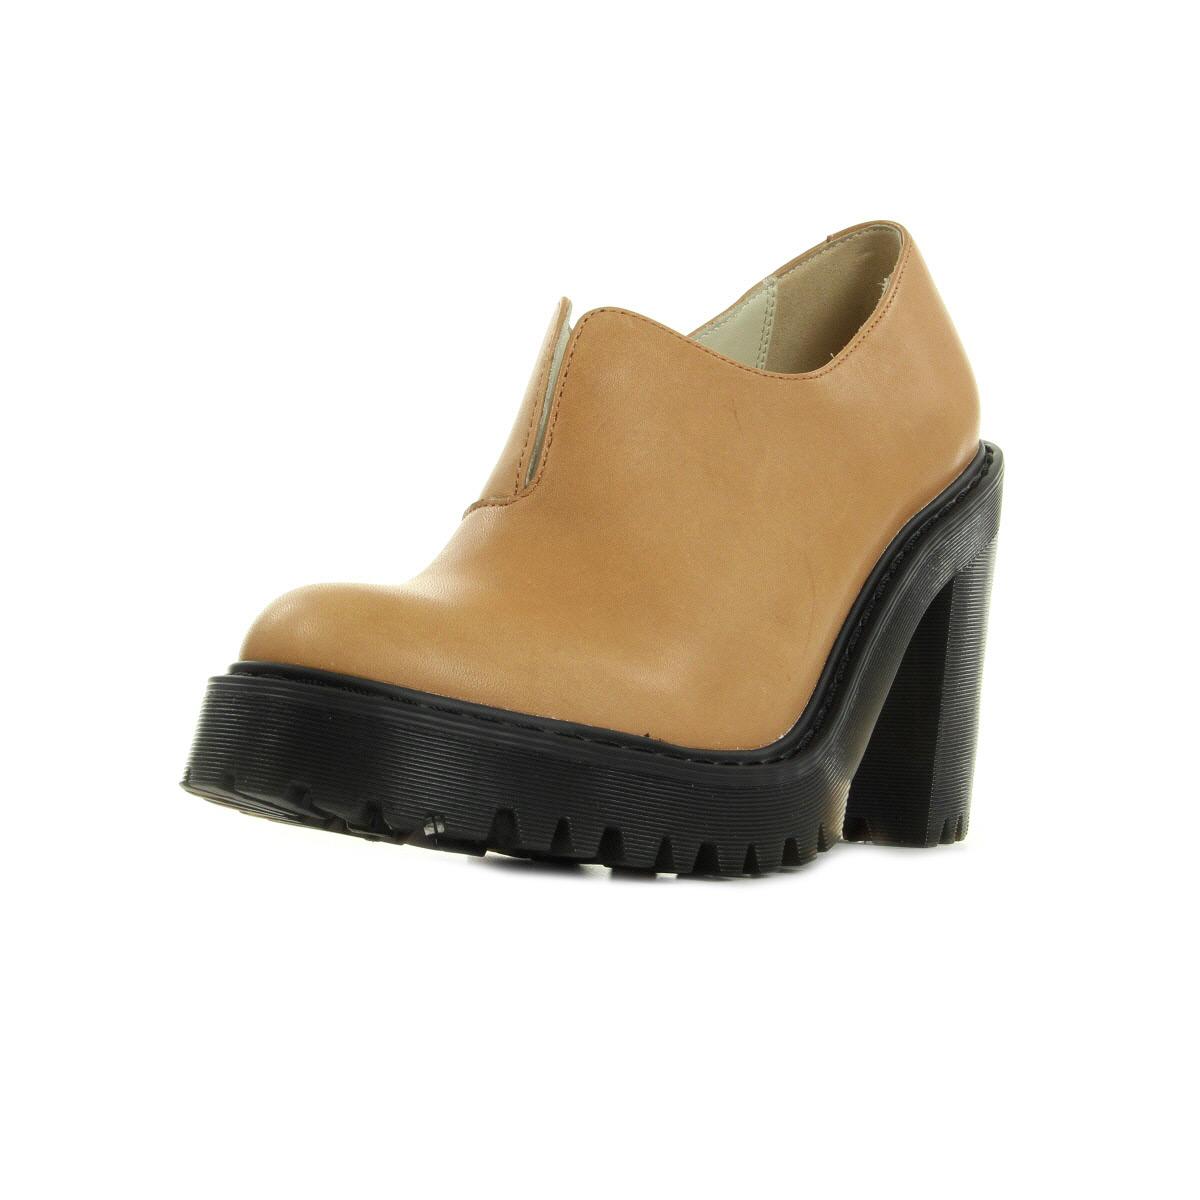 Chaussures Escarpins Dr Martens femme Cordelia Slip on Shoe taille Camel Cuir A